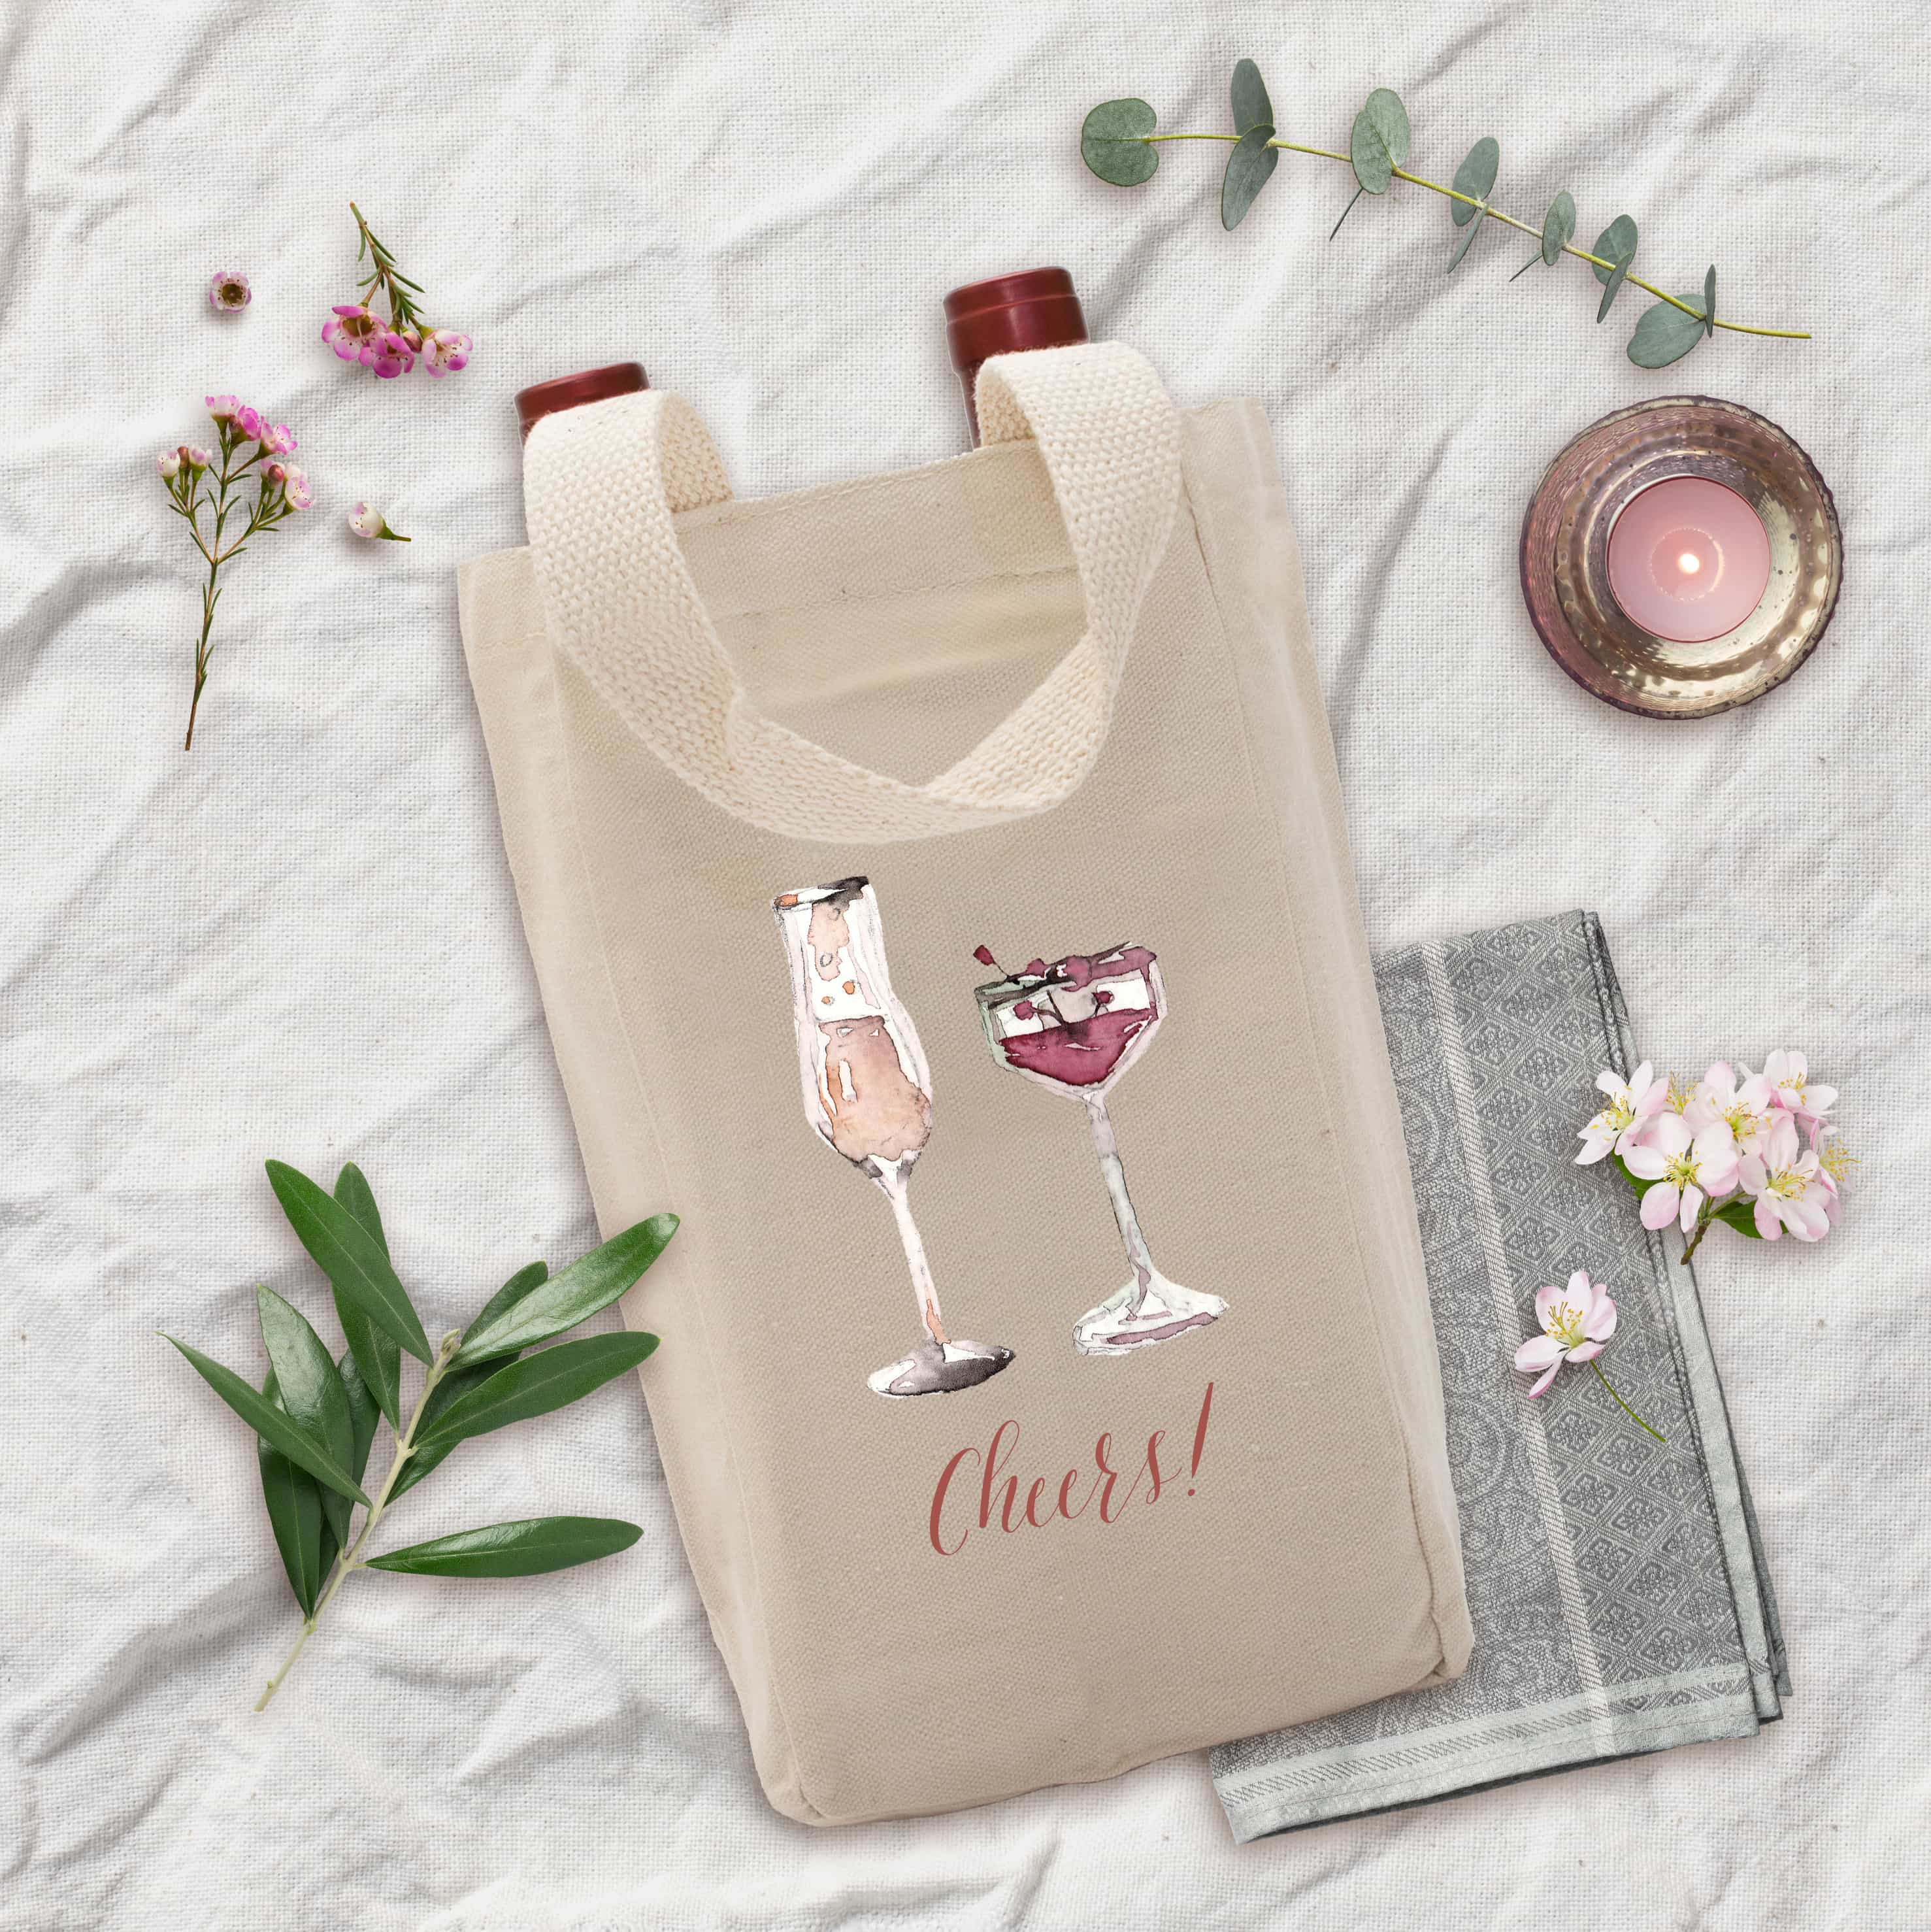 Posh Cottage Shop Winter 19 Cheers nat canvas wine tote